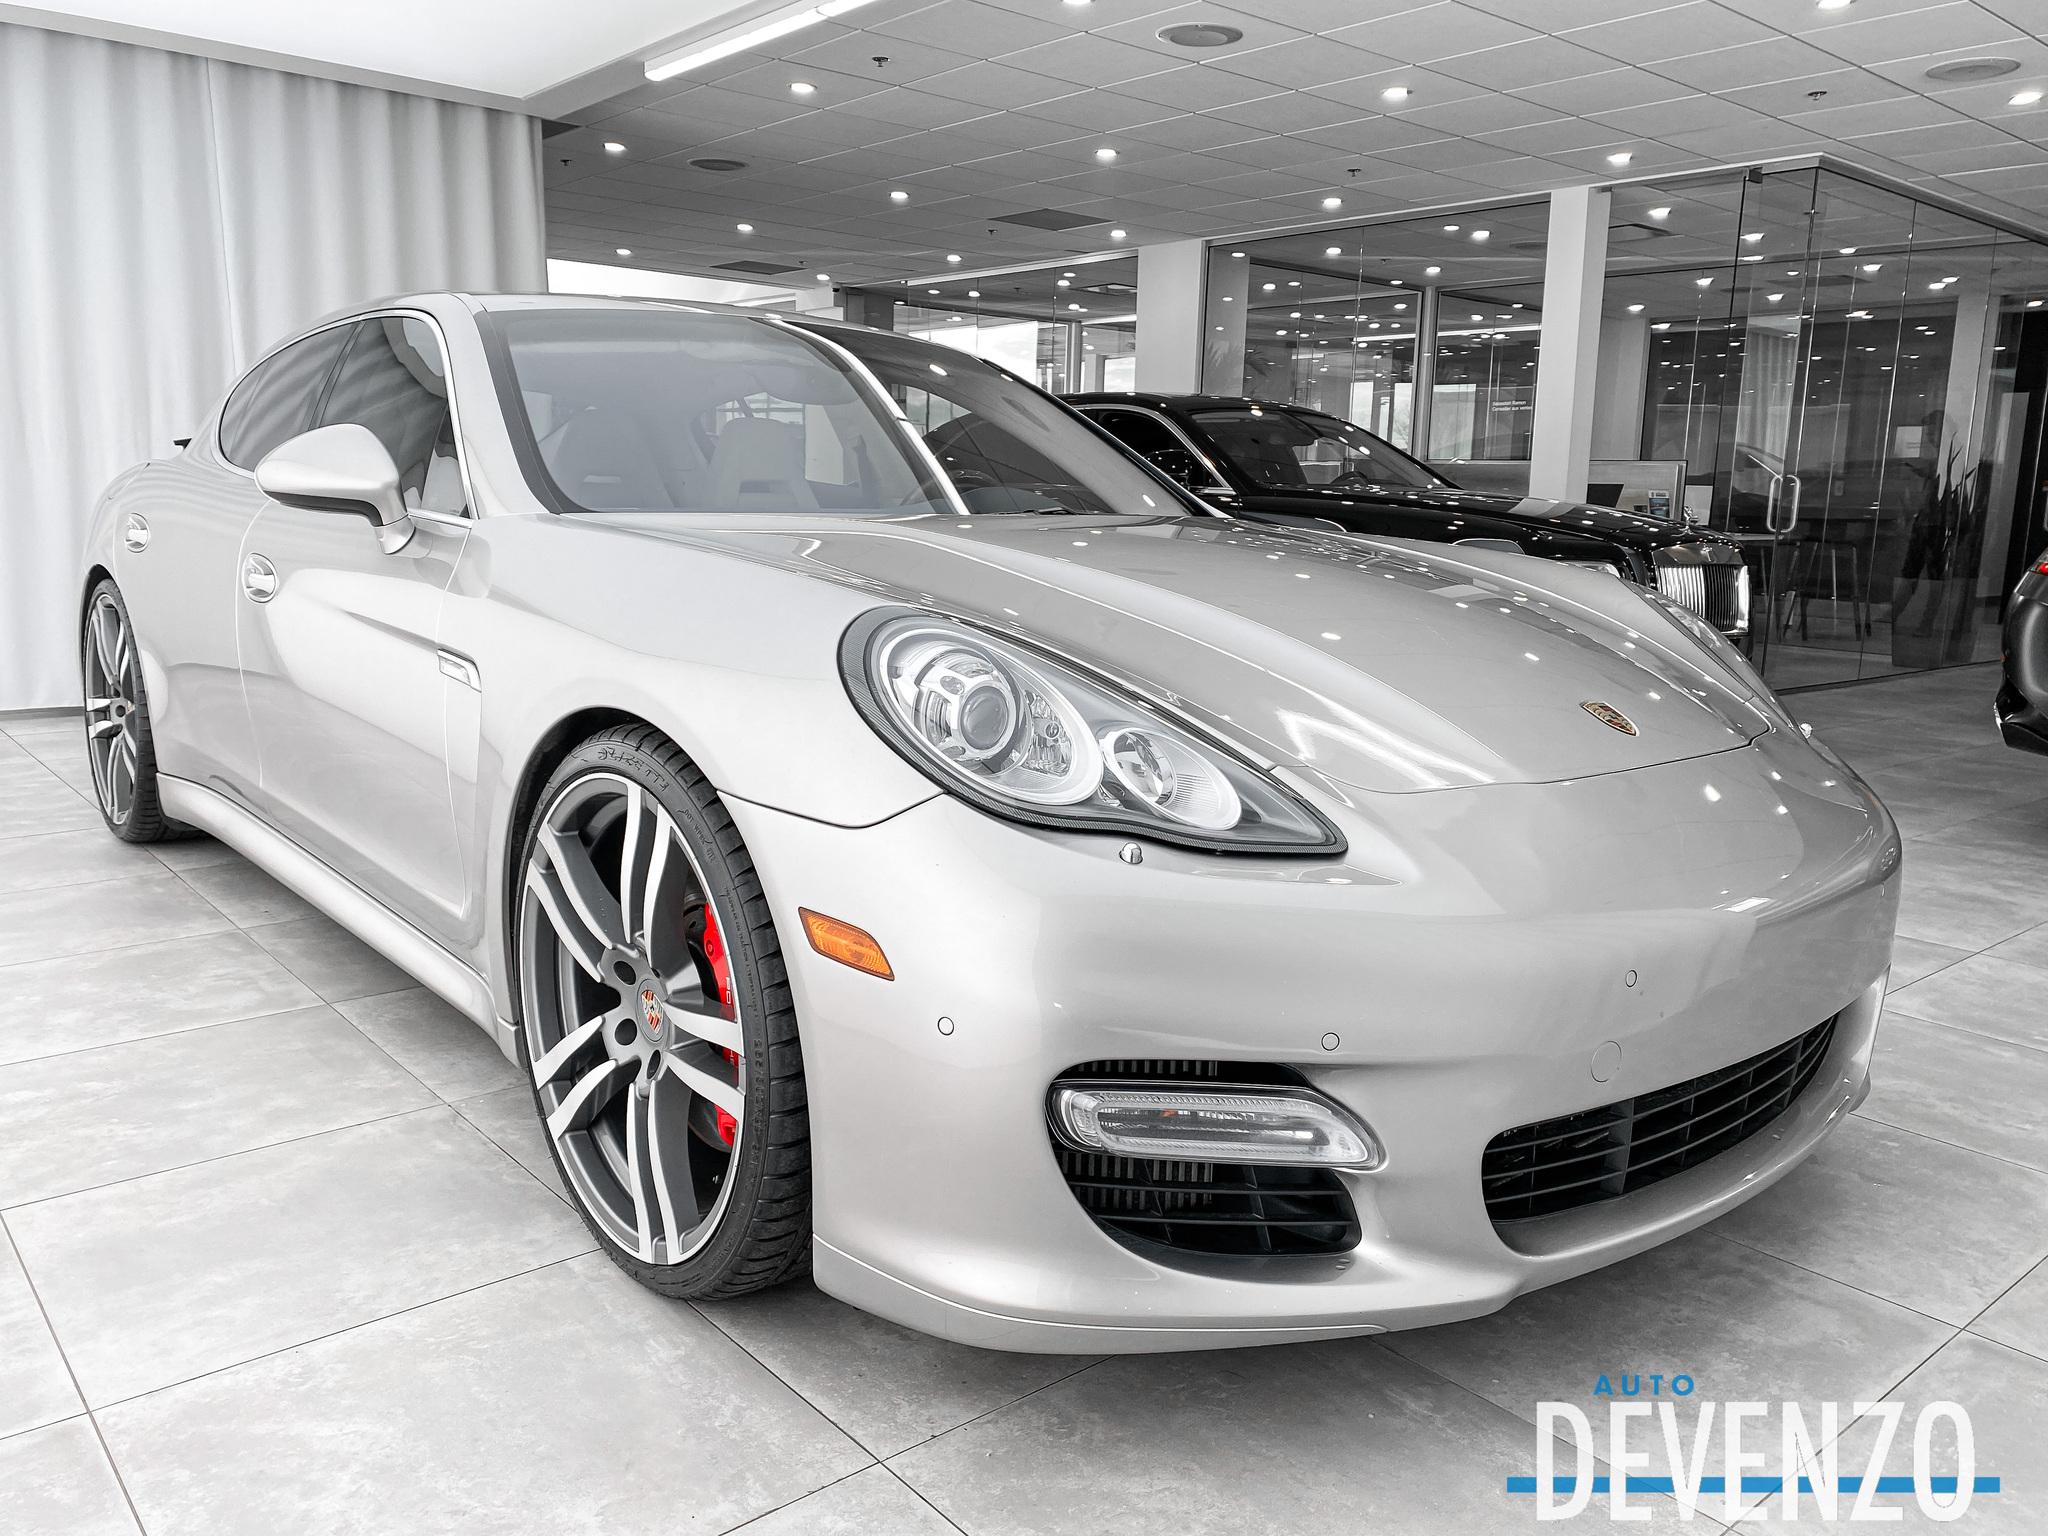 2010 Porsche Panamera HB Turbo 4.8L 500HP complet